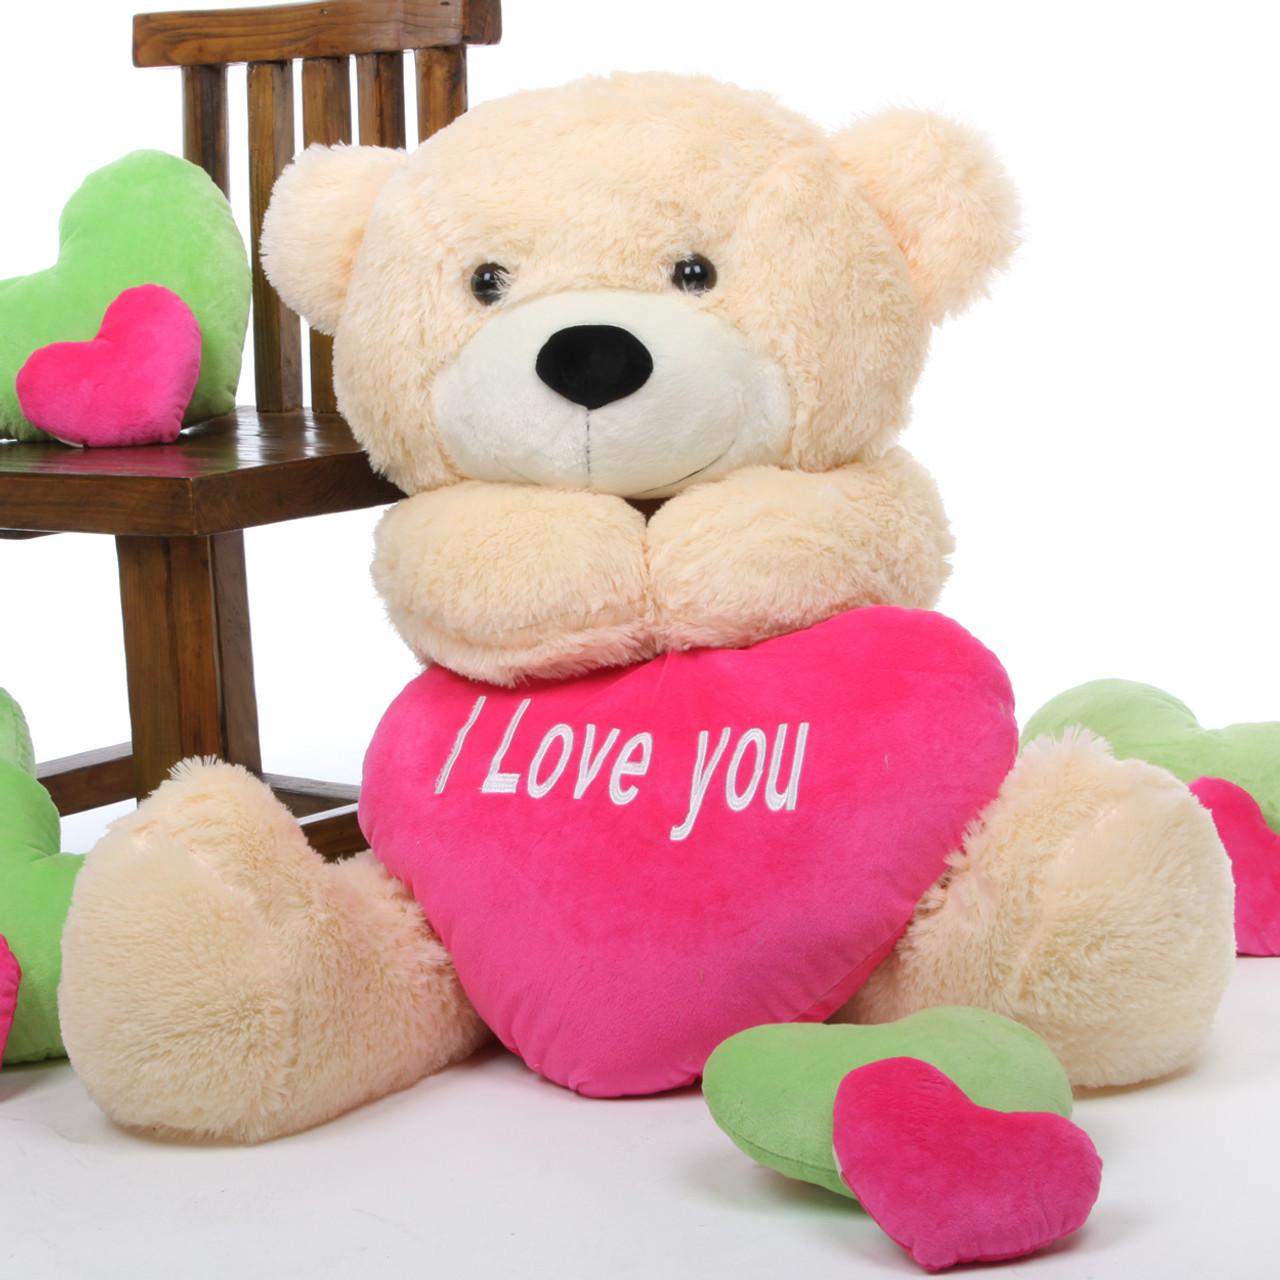 Cozy Love Cuddles With Big I You Heart Cream Teddy Bear 38in